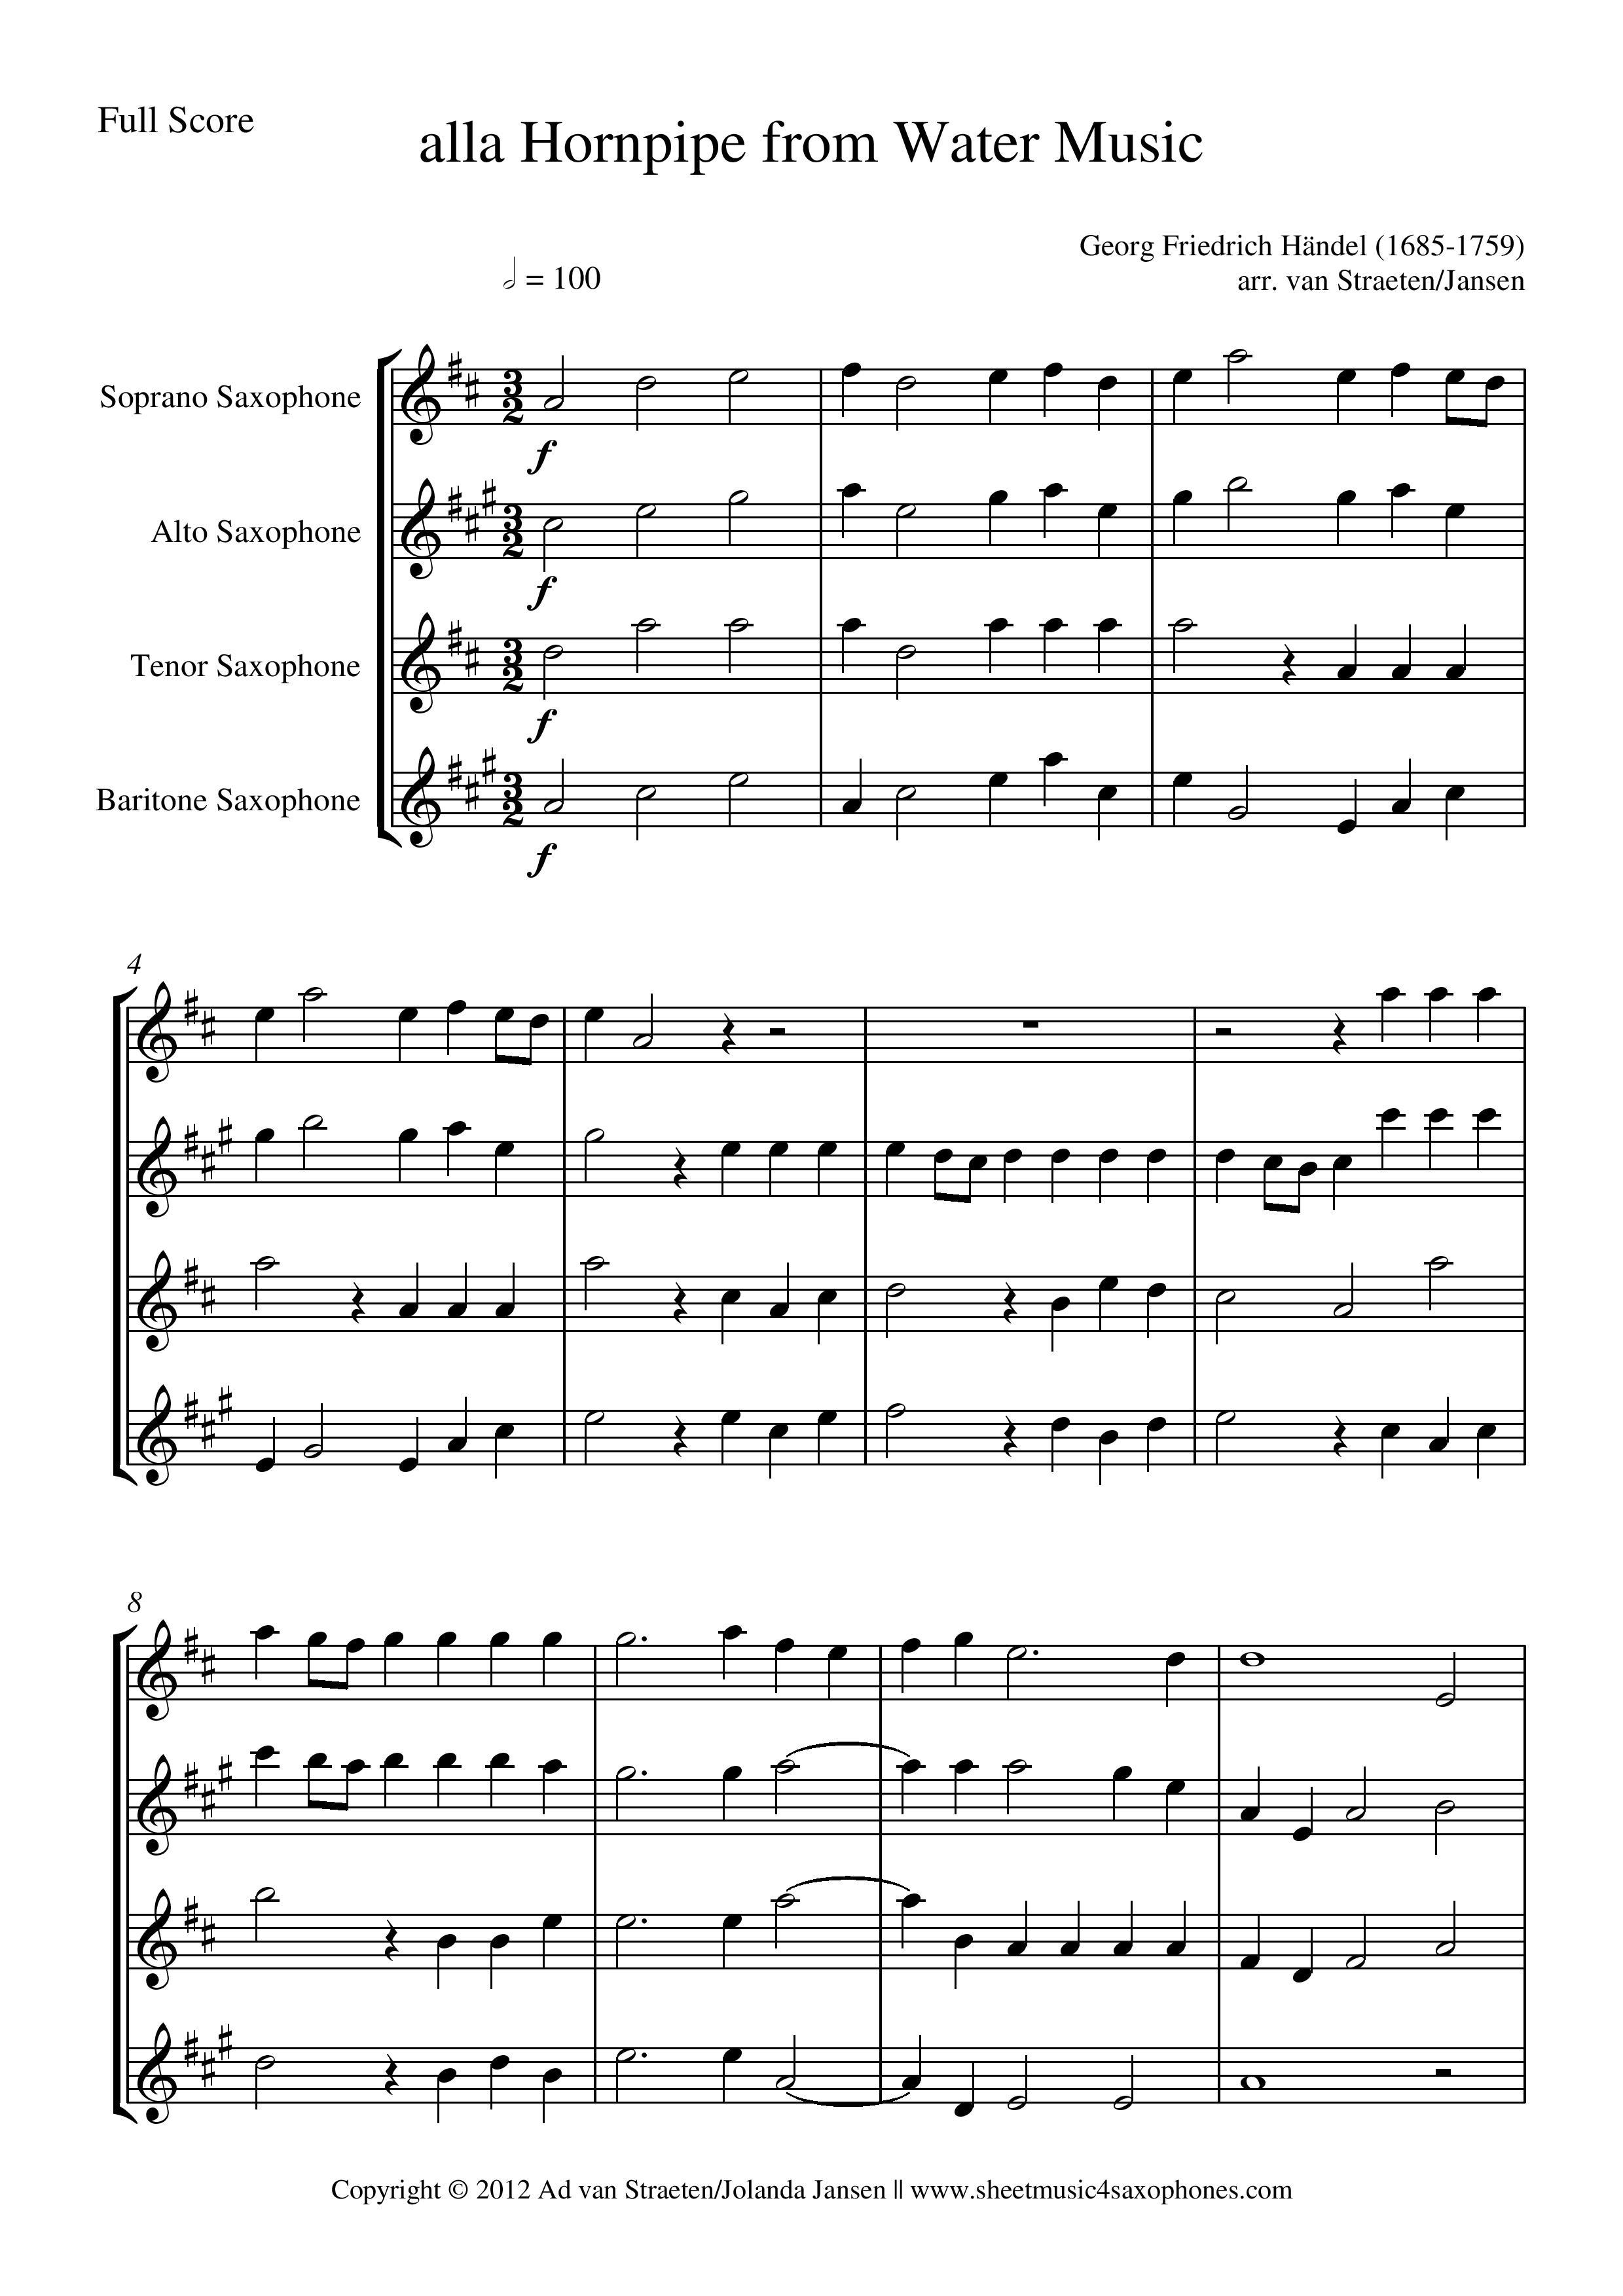 Händel: alla Hornpipe from Water Music for Saxophone Quartet